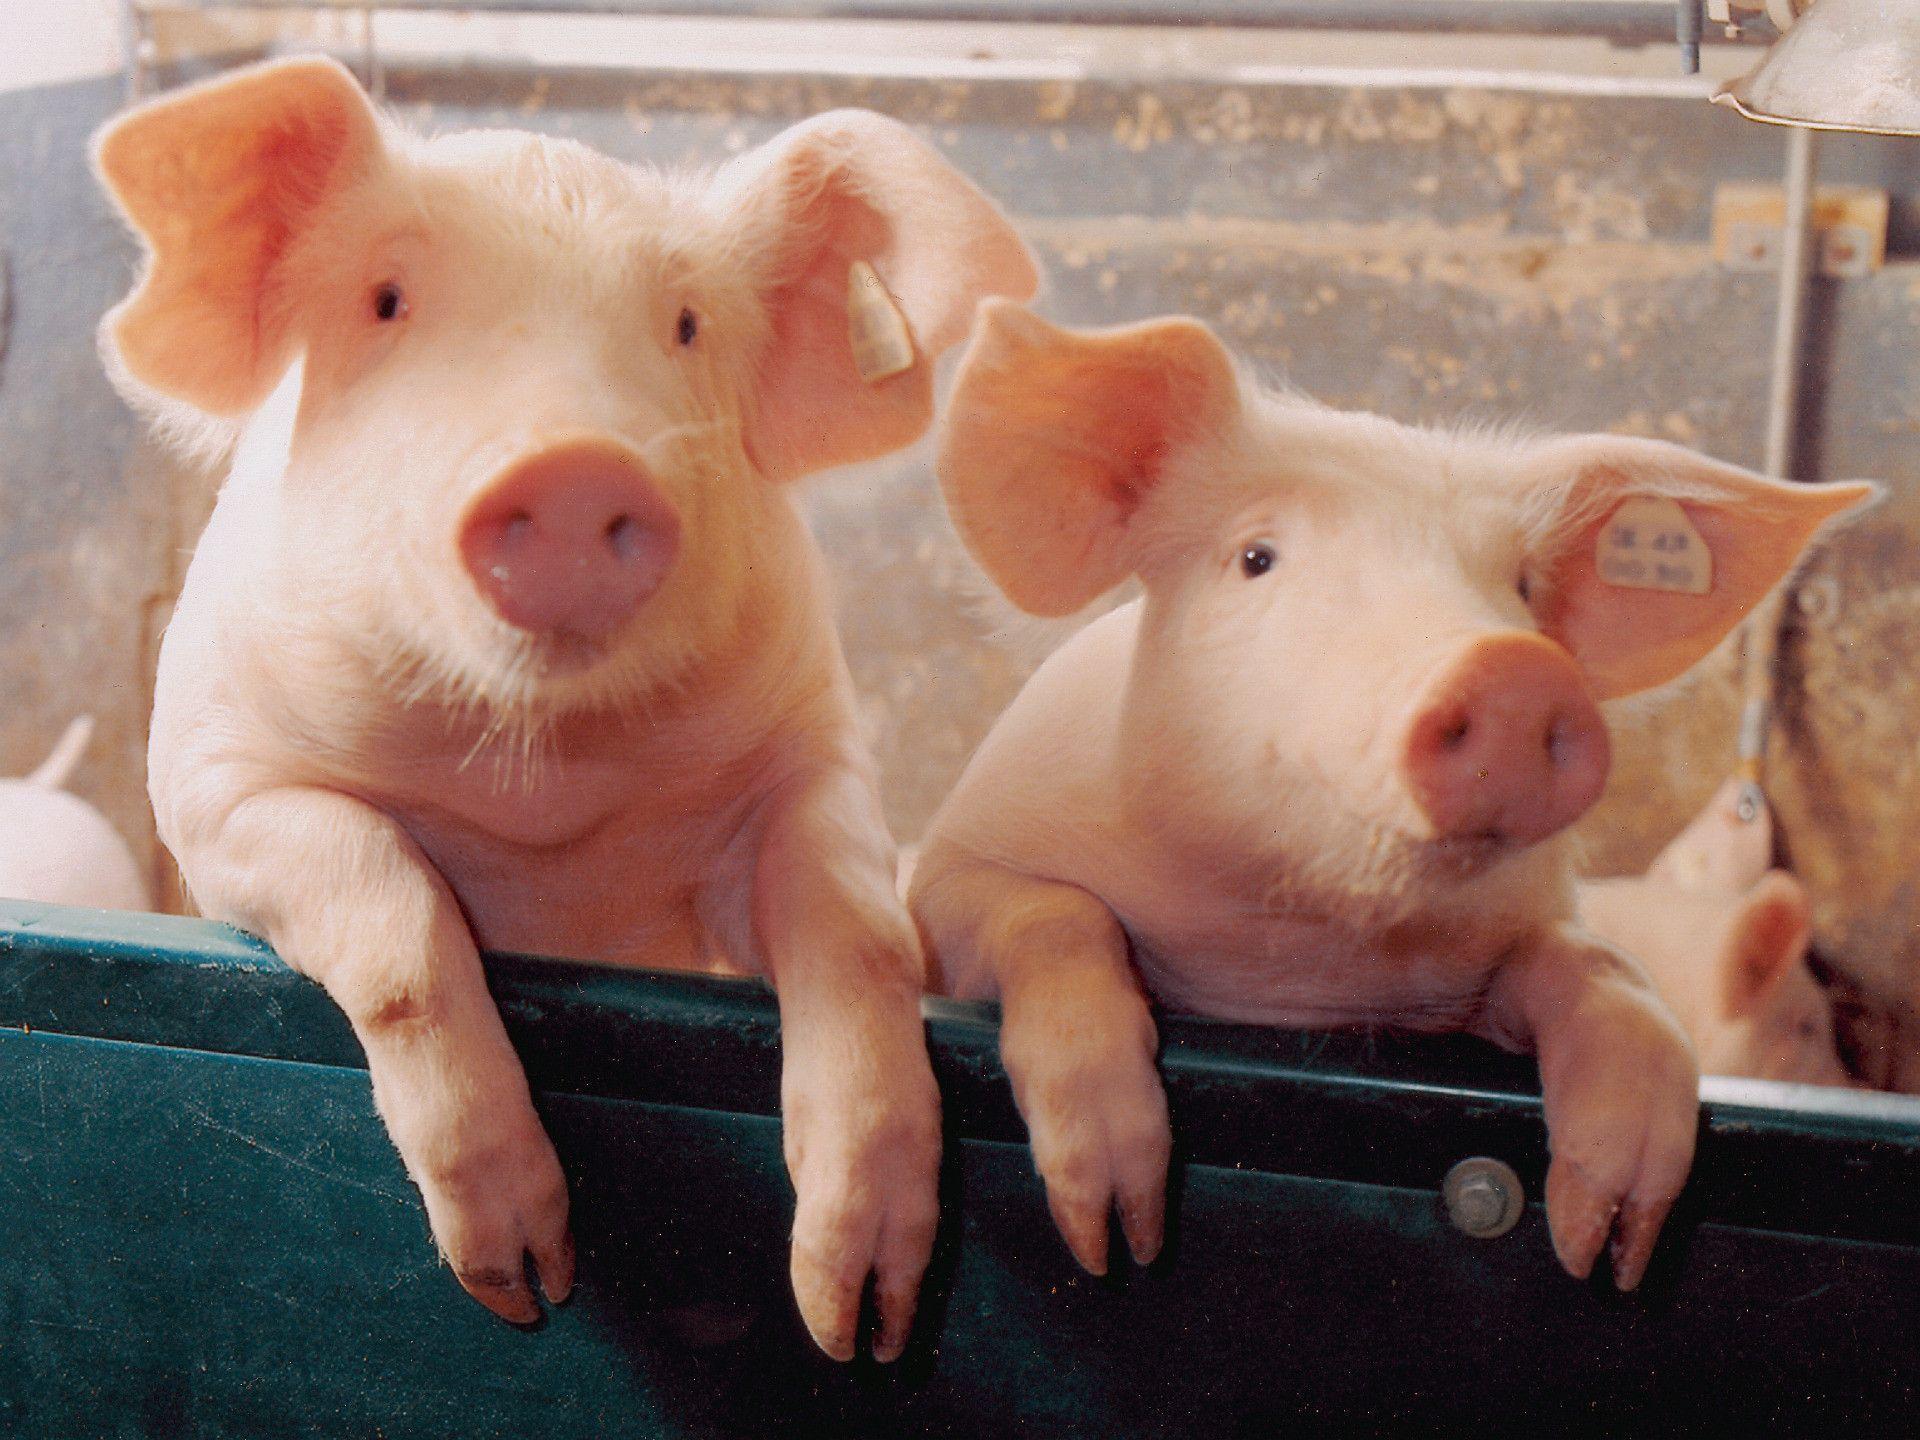 Two little Piggies - Pigs Wallpaper (1078267) - Fanpop